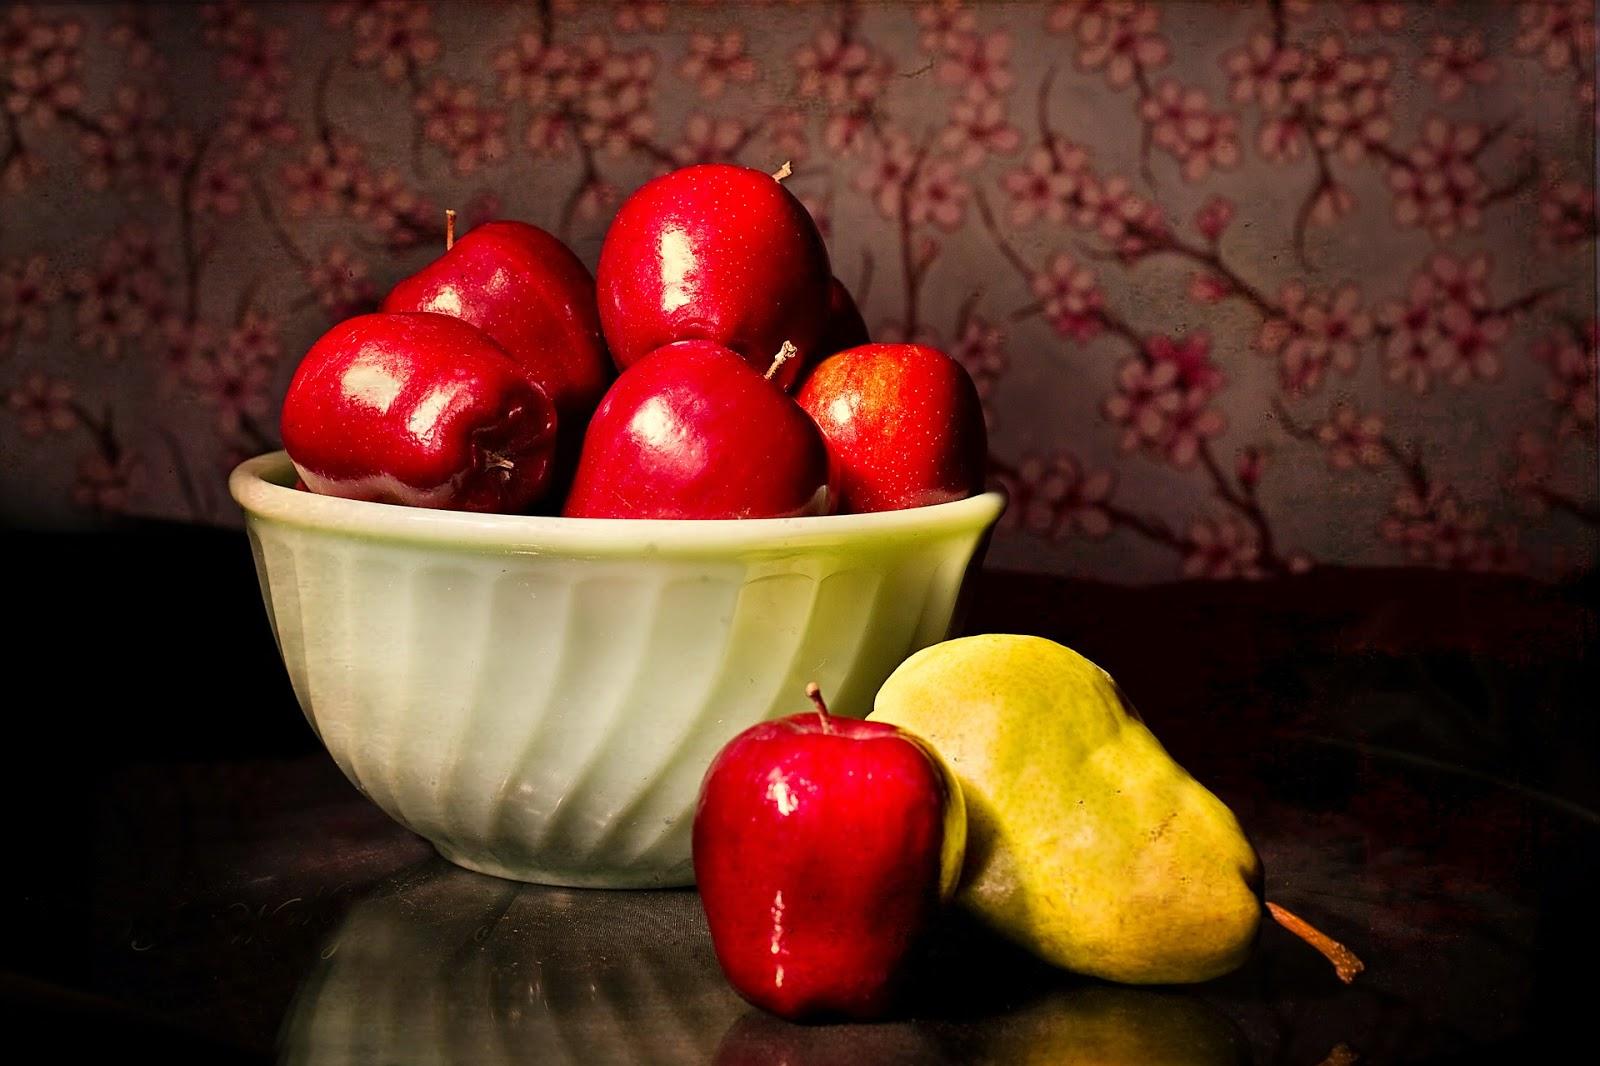 Tip για να πλύνετε τα φρούτα που καταναλώνετε με την φλούδα τους